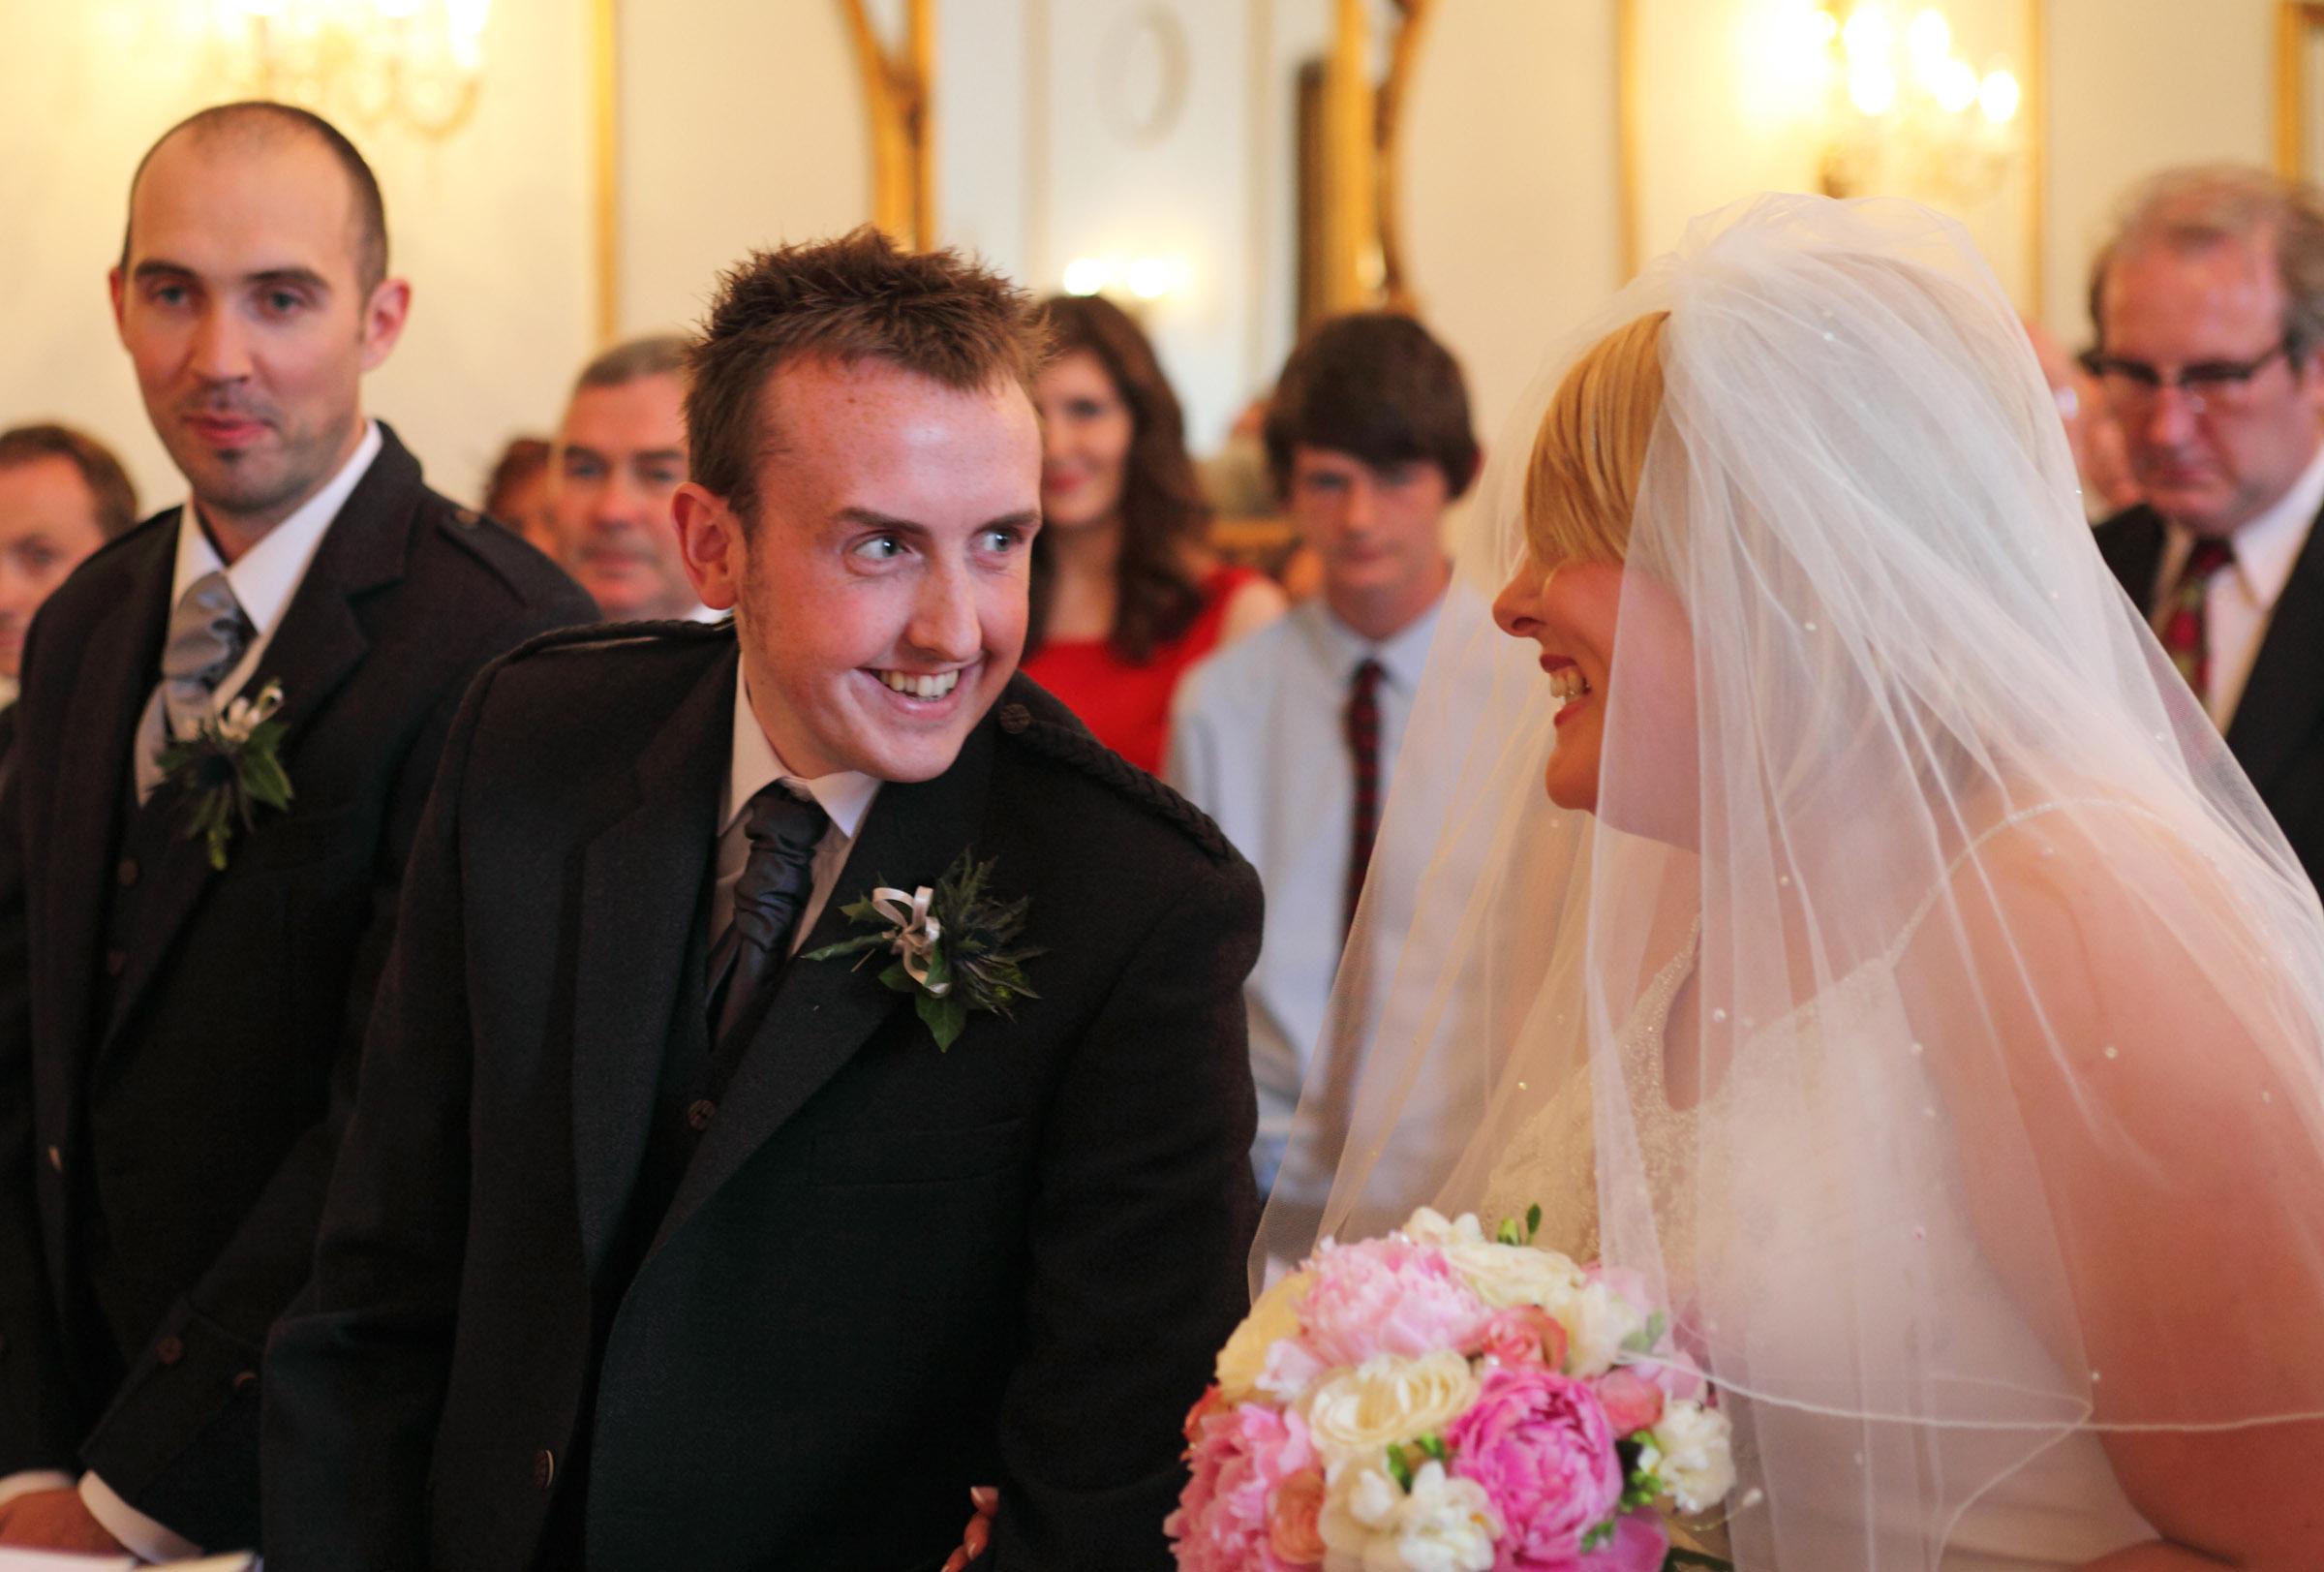 Cheeky_grin captured_wedding ceremony.jpg